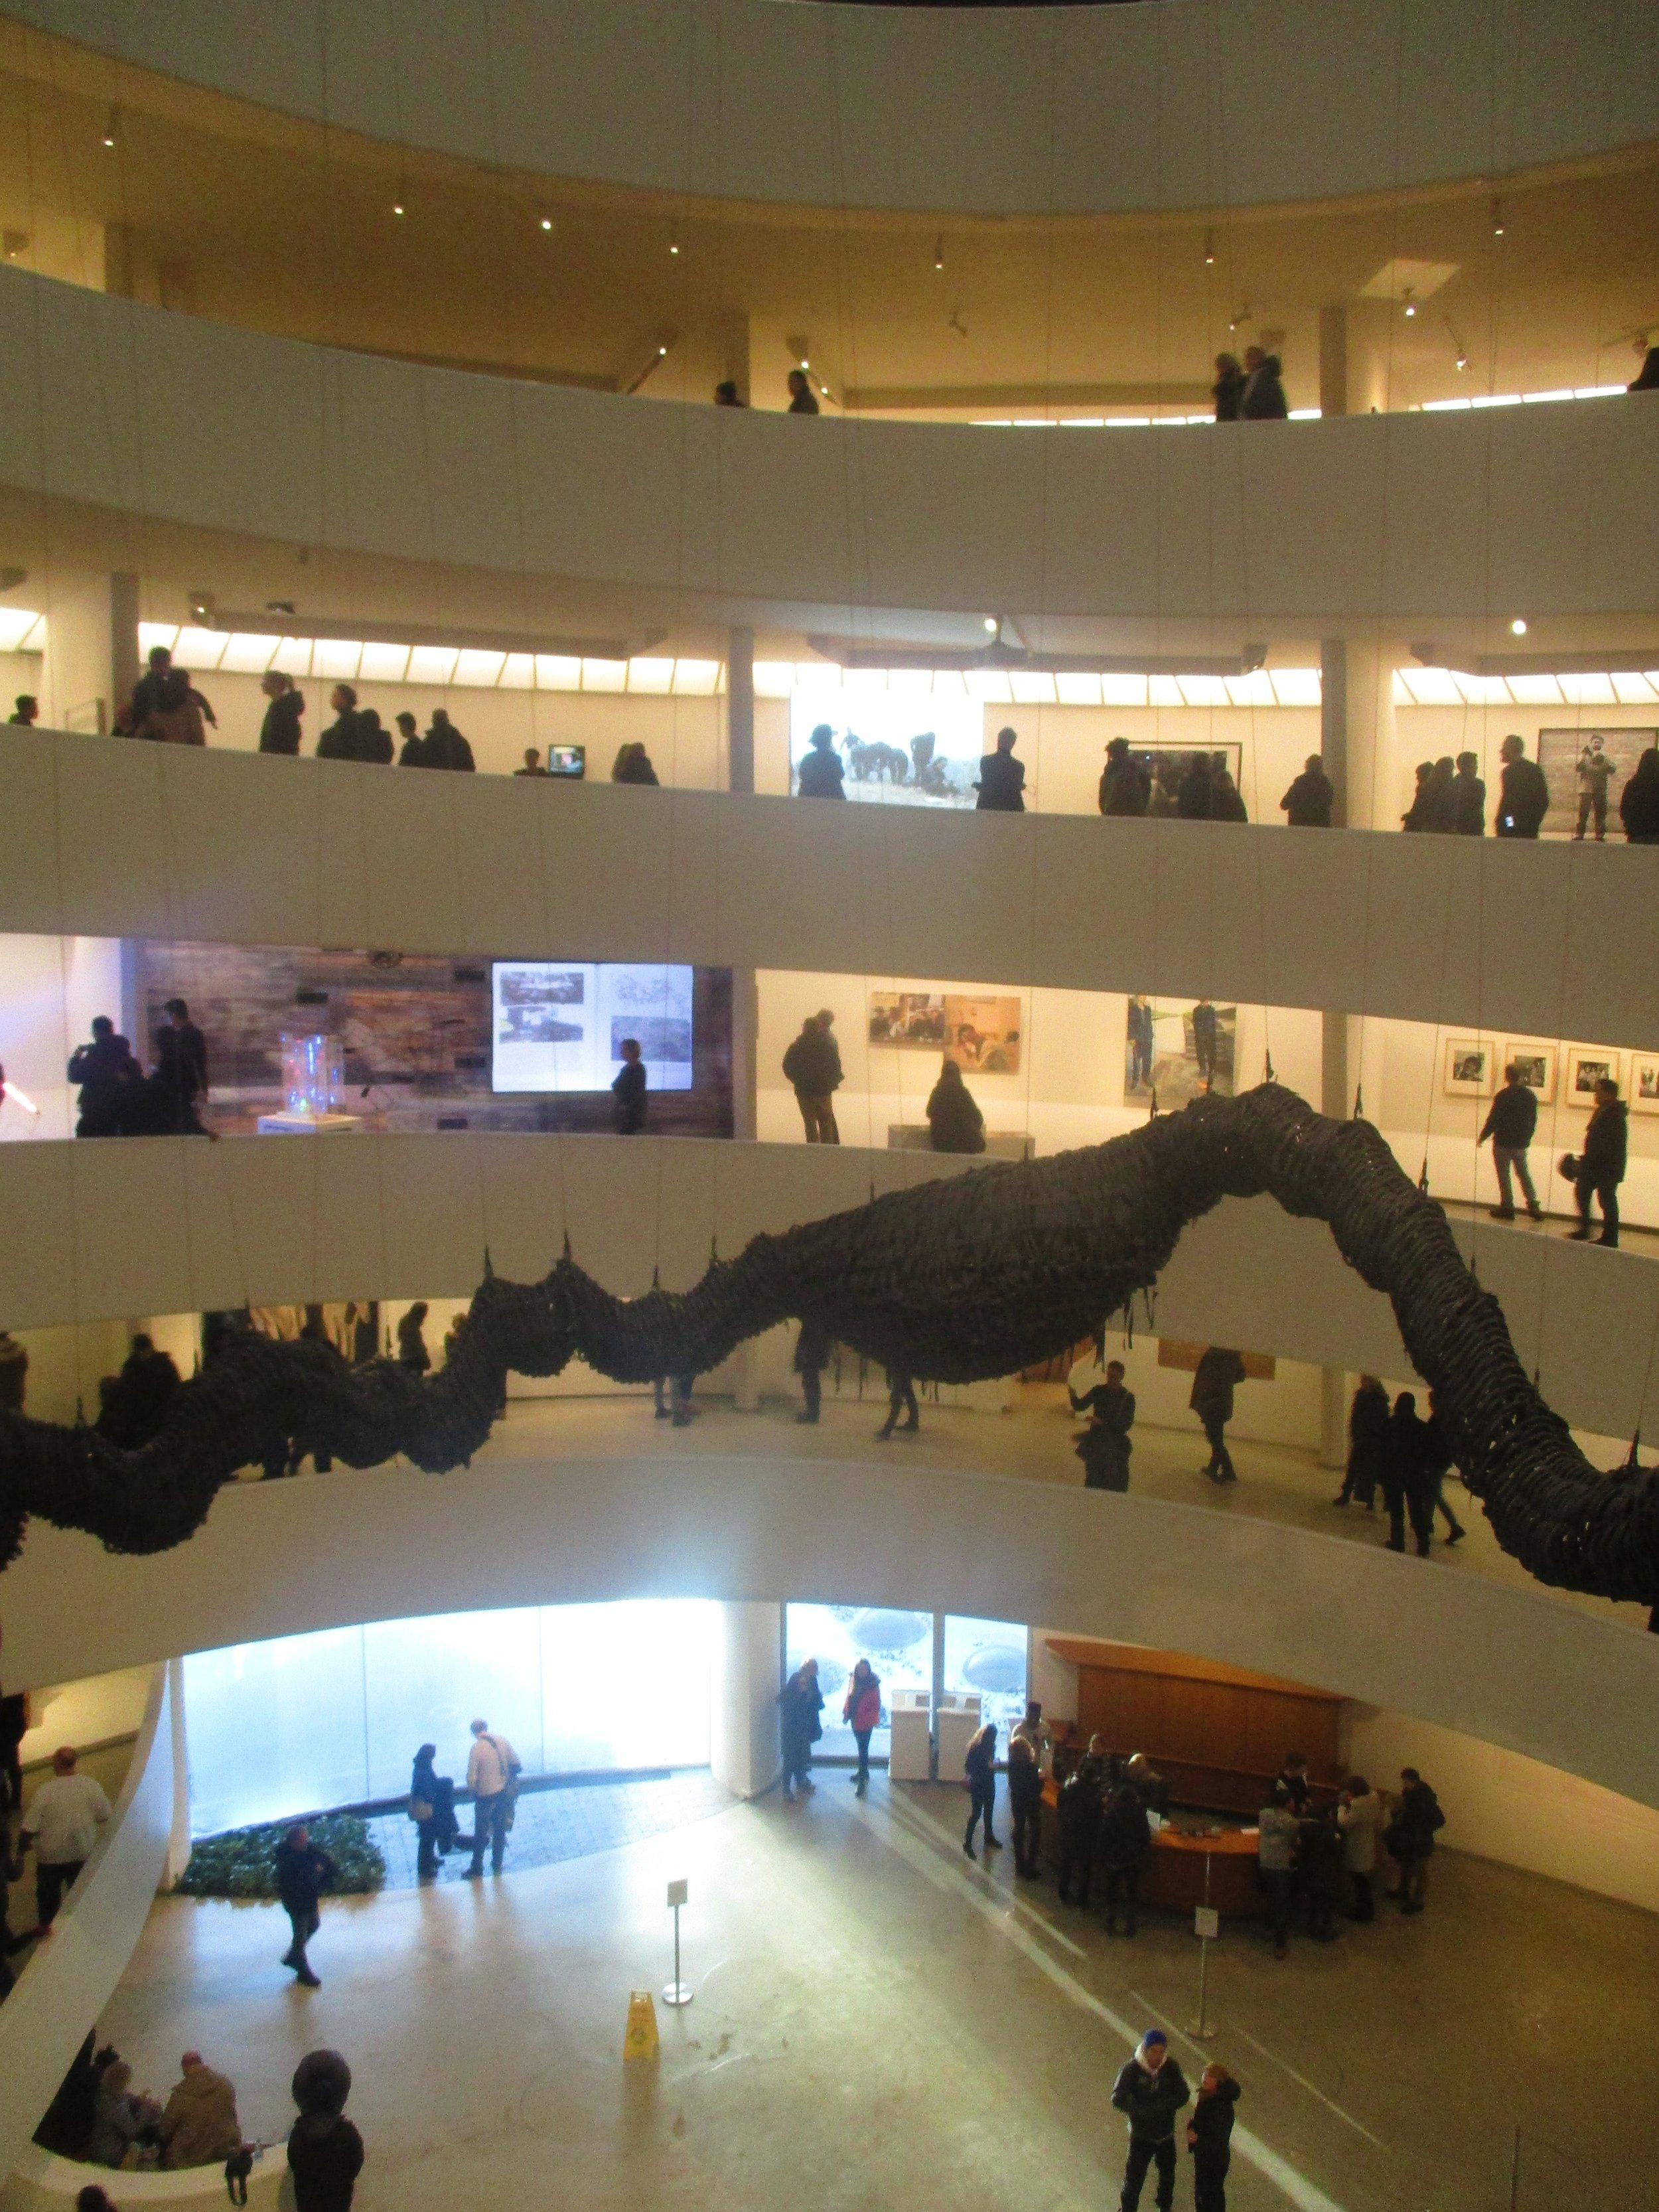 A large intestine has colonized the Guggenheim.